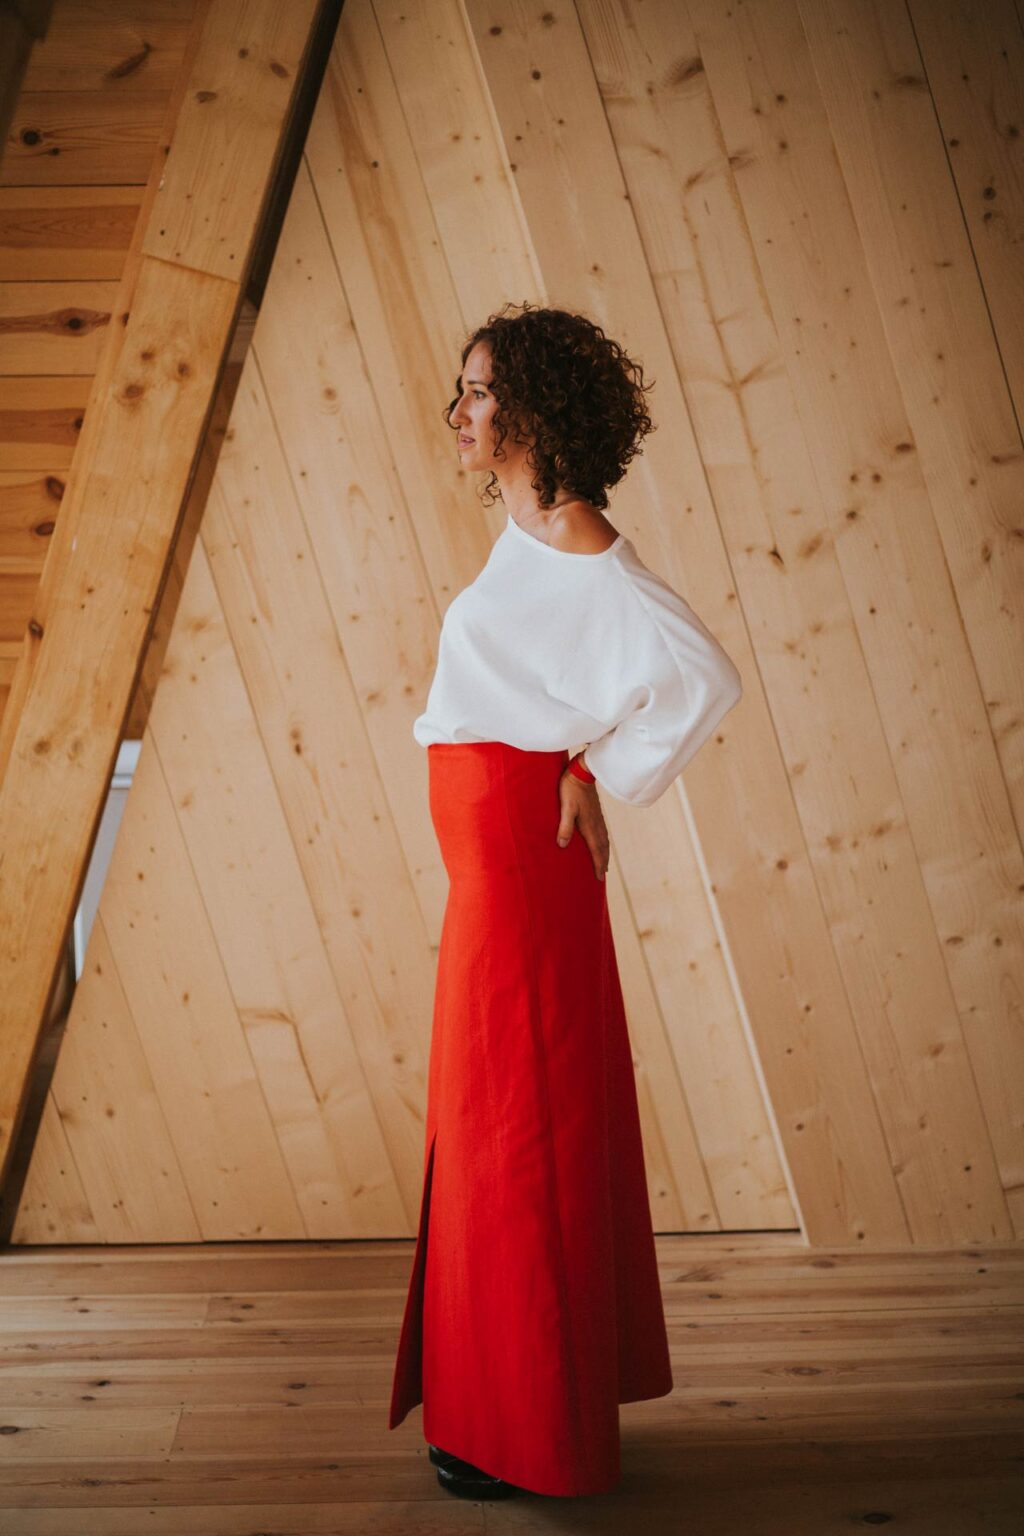 Rojo-Maldita-María-Falda-larga-abertura